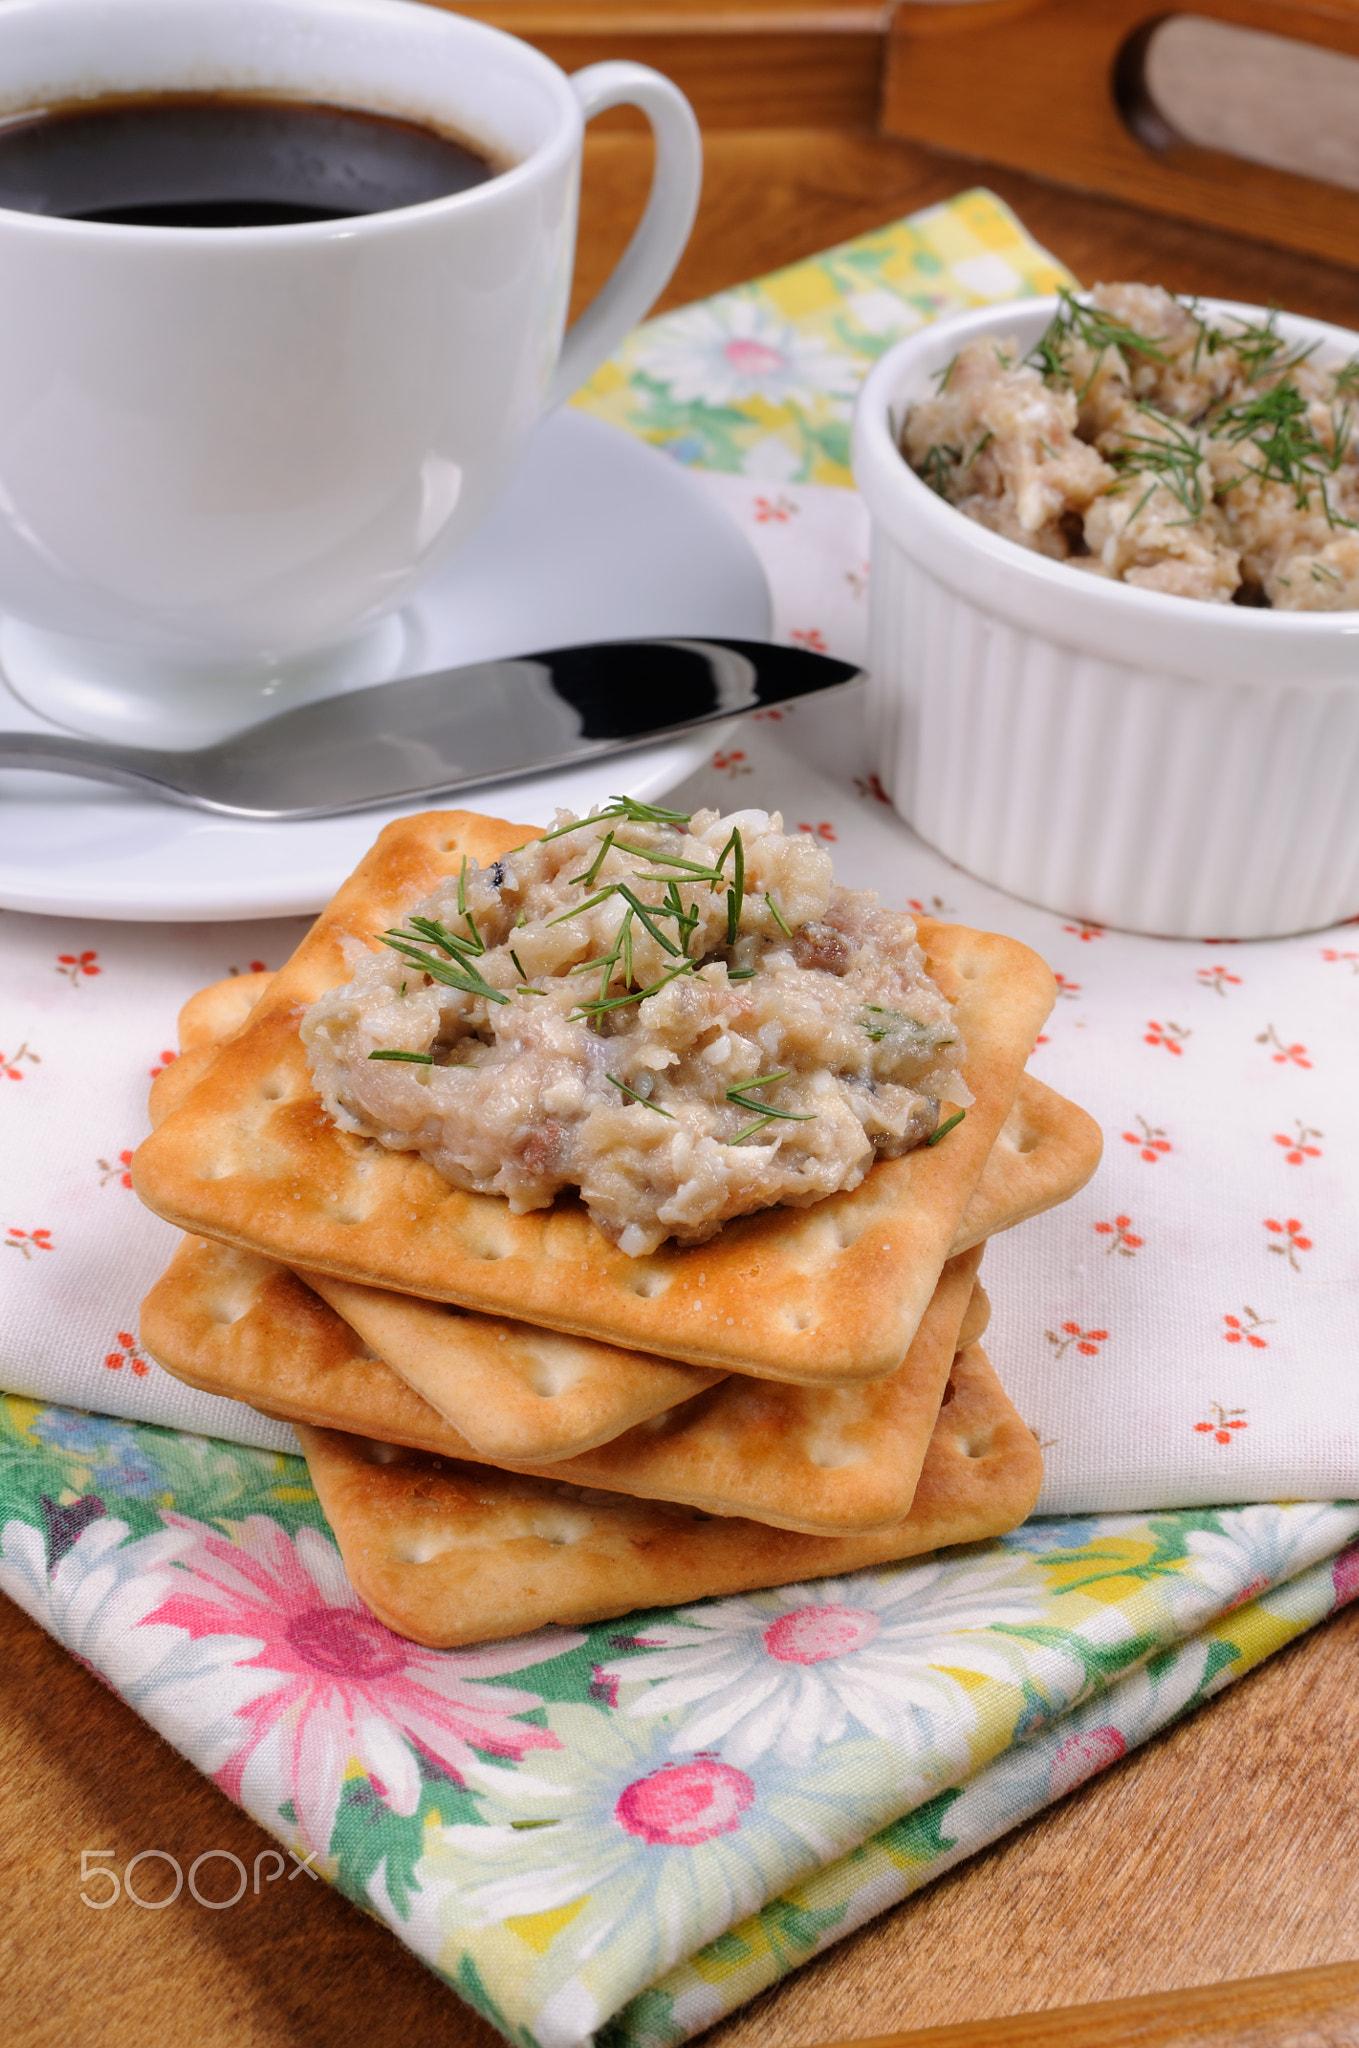 Appetizer of pate herring (forshmak)